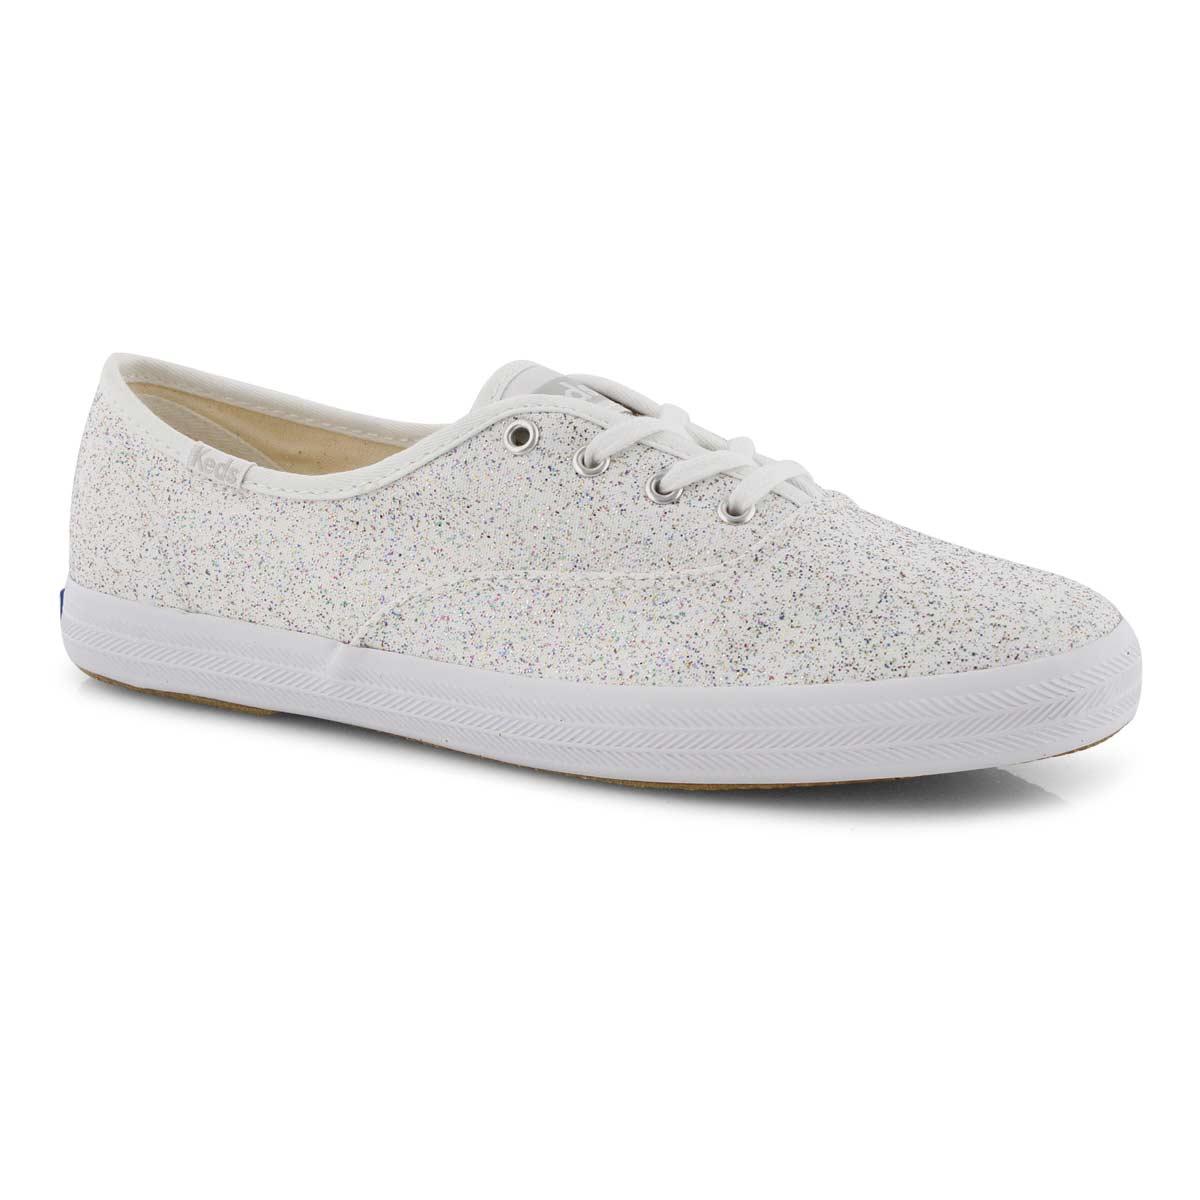 1170141d7444 Keds Women's CHAMPION STARLIGHT white sneaker | Softmoc.com